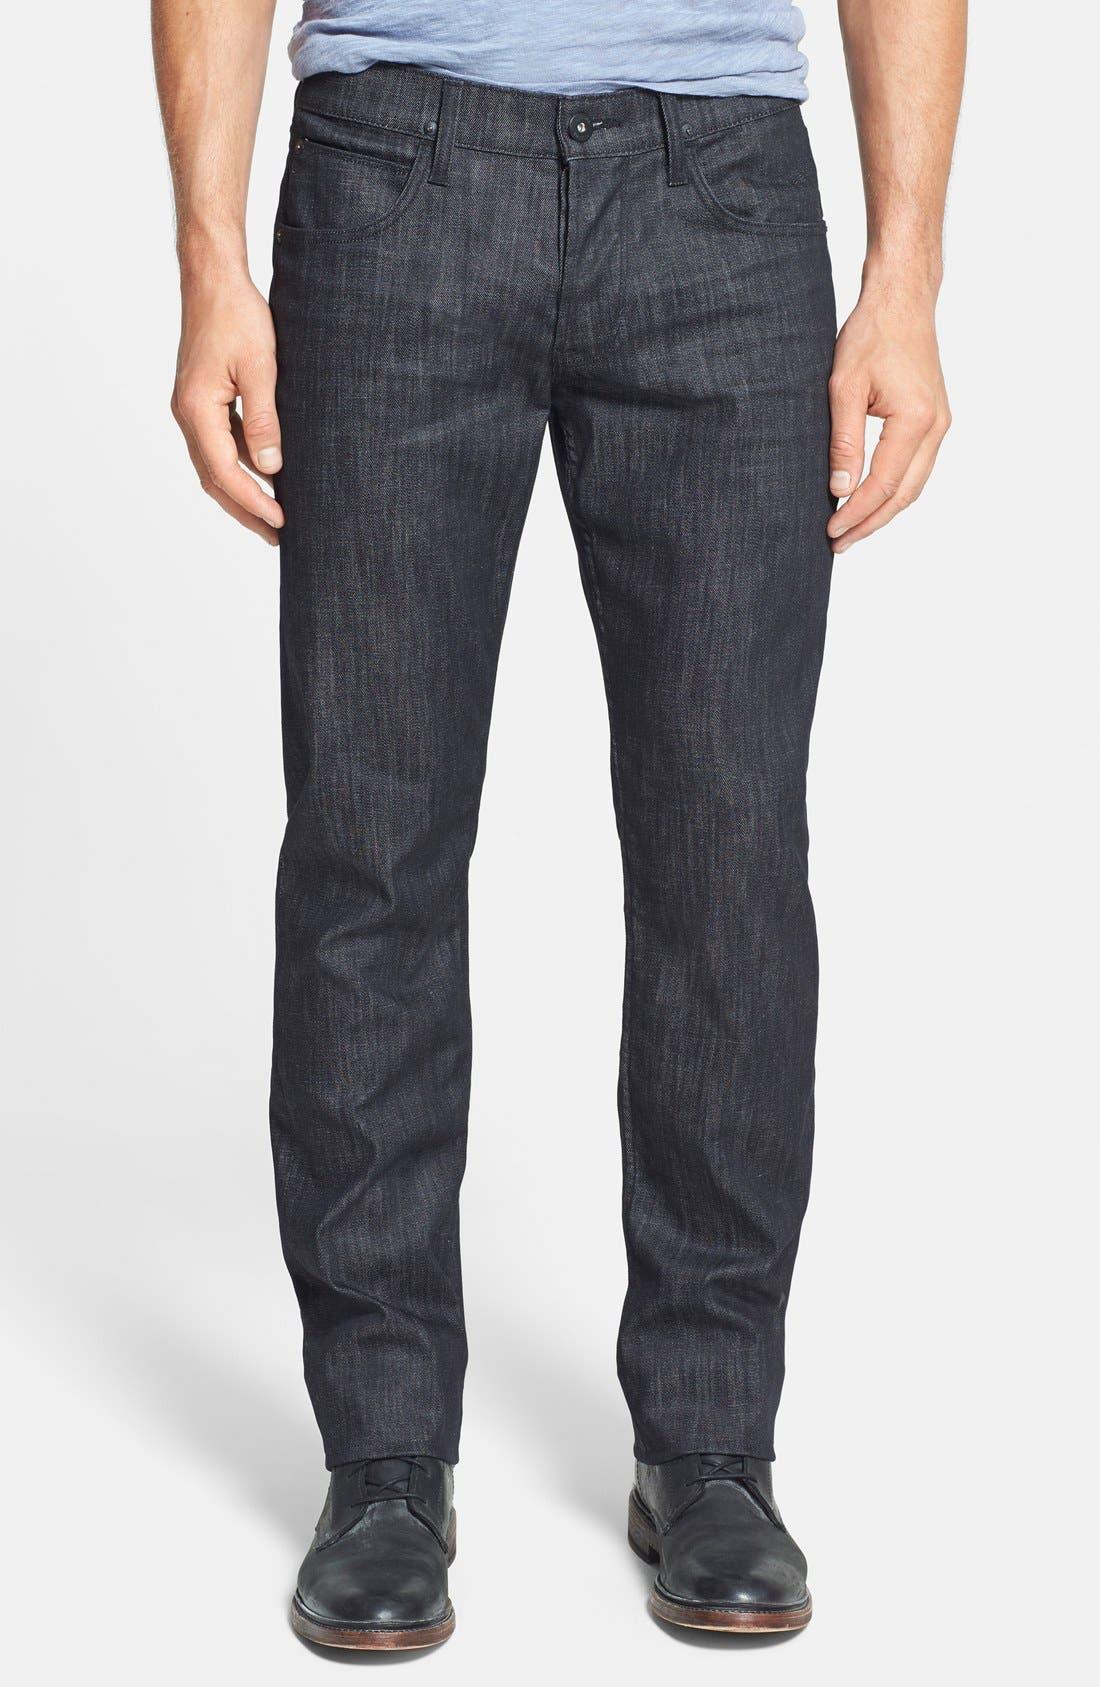 Alternate Image 1 Selected - Hudson Jeans 'Byron' Straight Leg Jeans (Mogul)